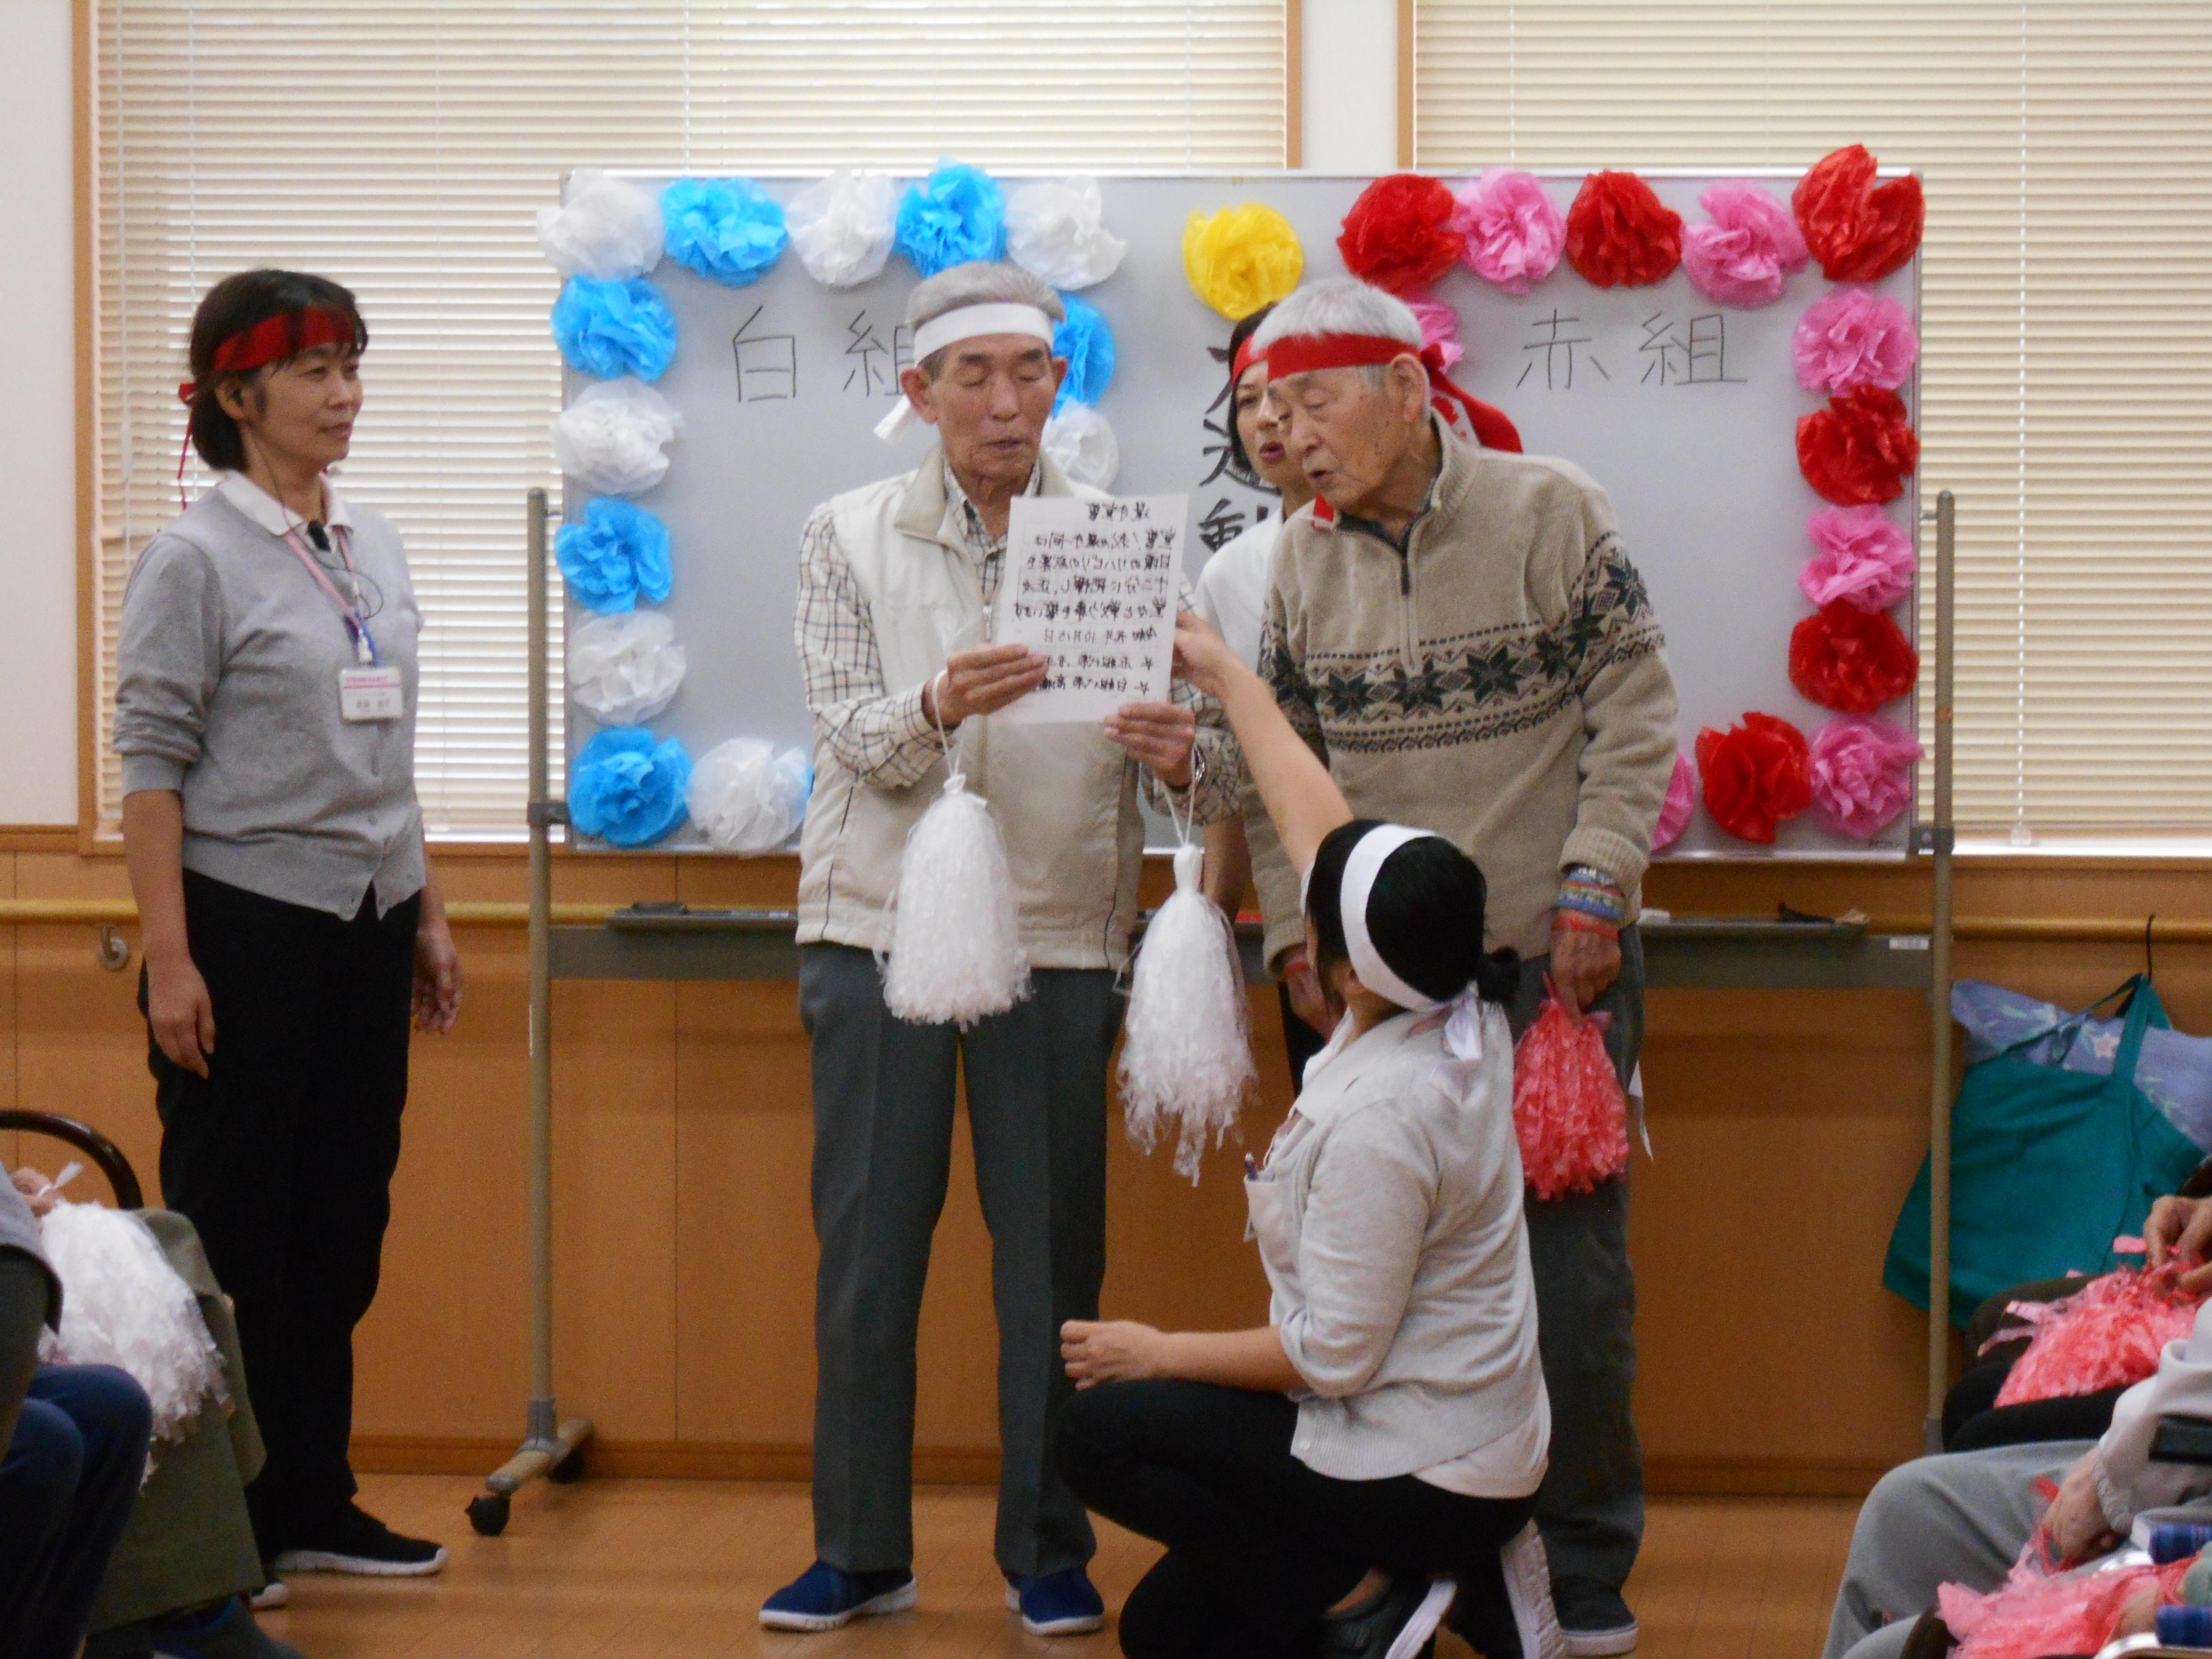 ✨松浜✨🍂秋の大運動会🍄🍄